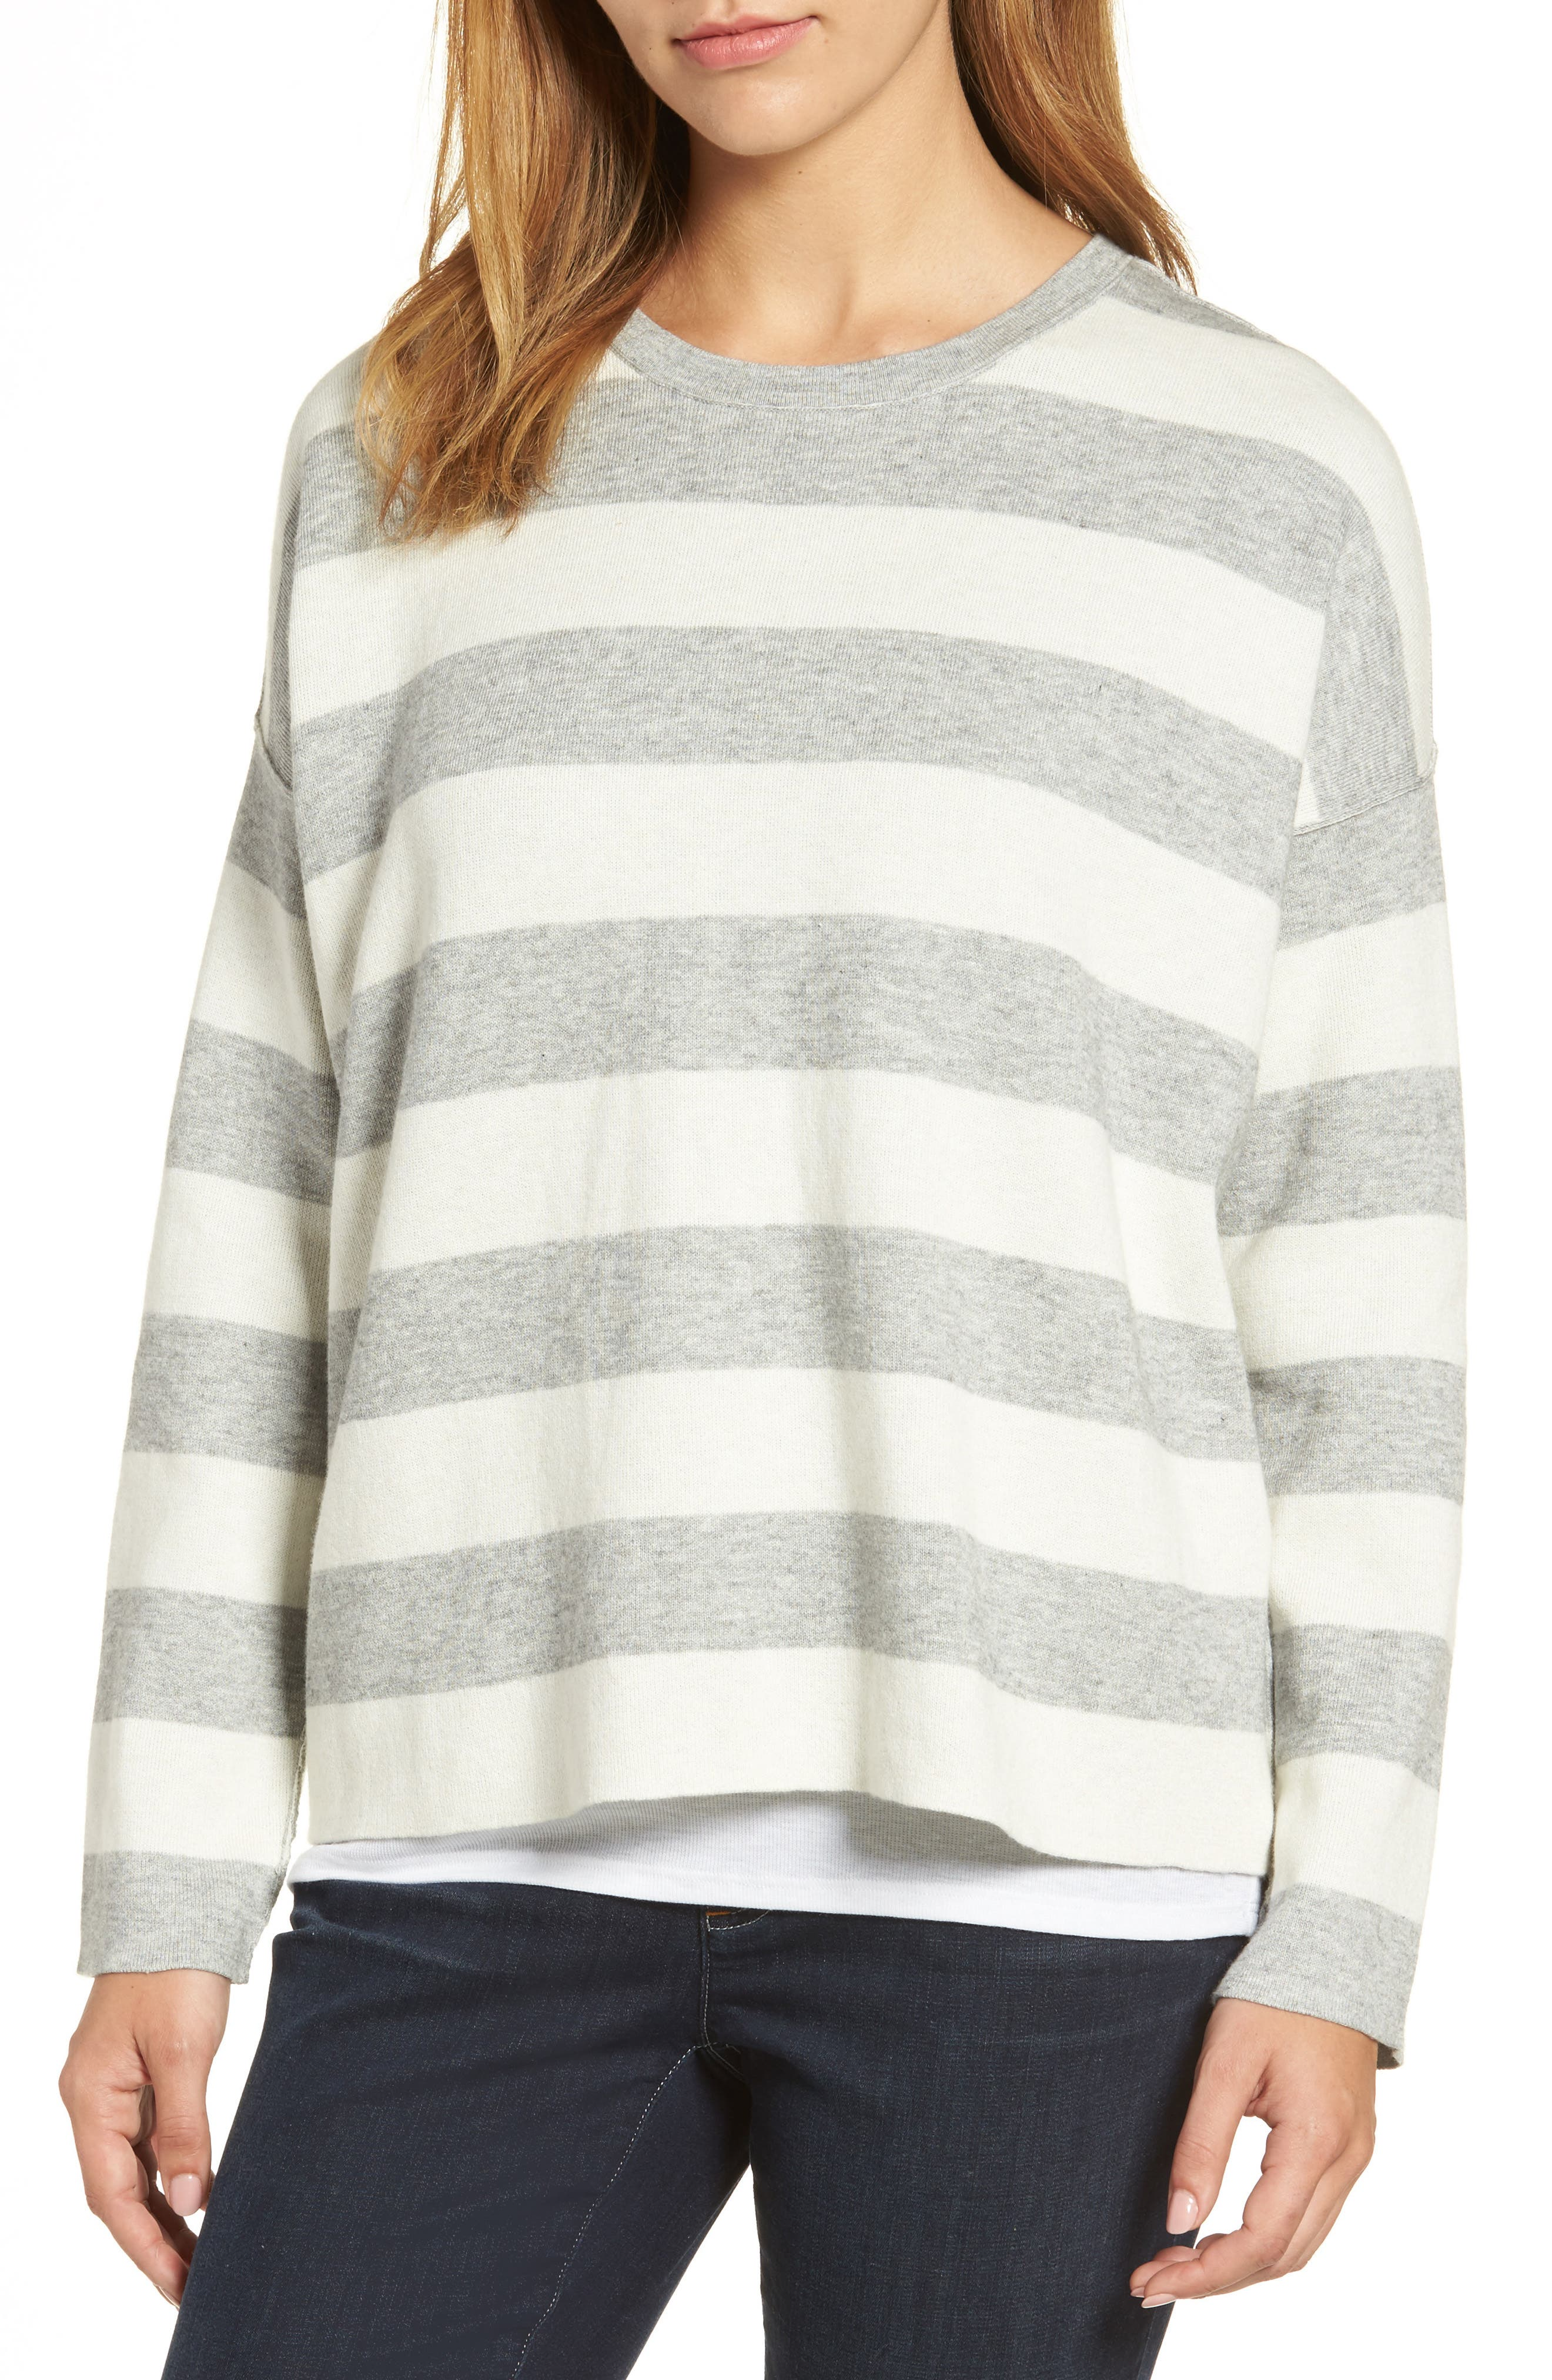 Eileen Fisher Stripe Organic Cotton Blend Top